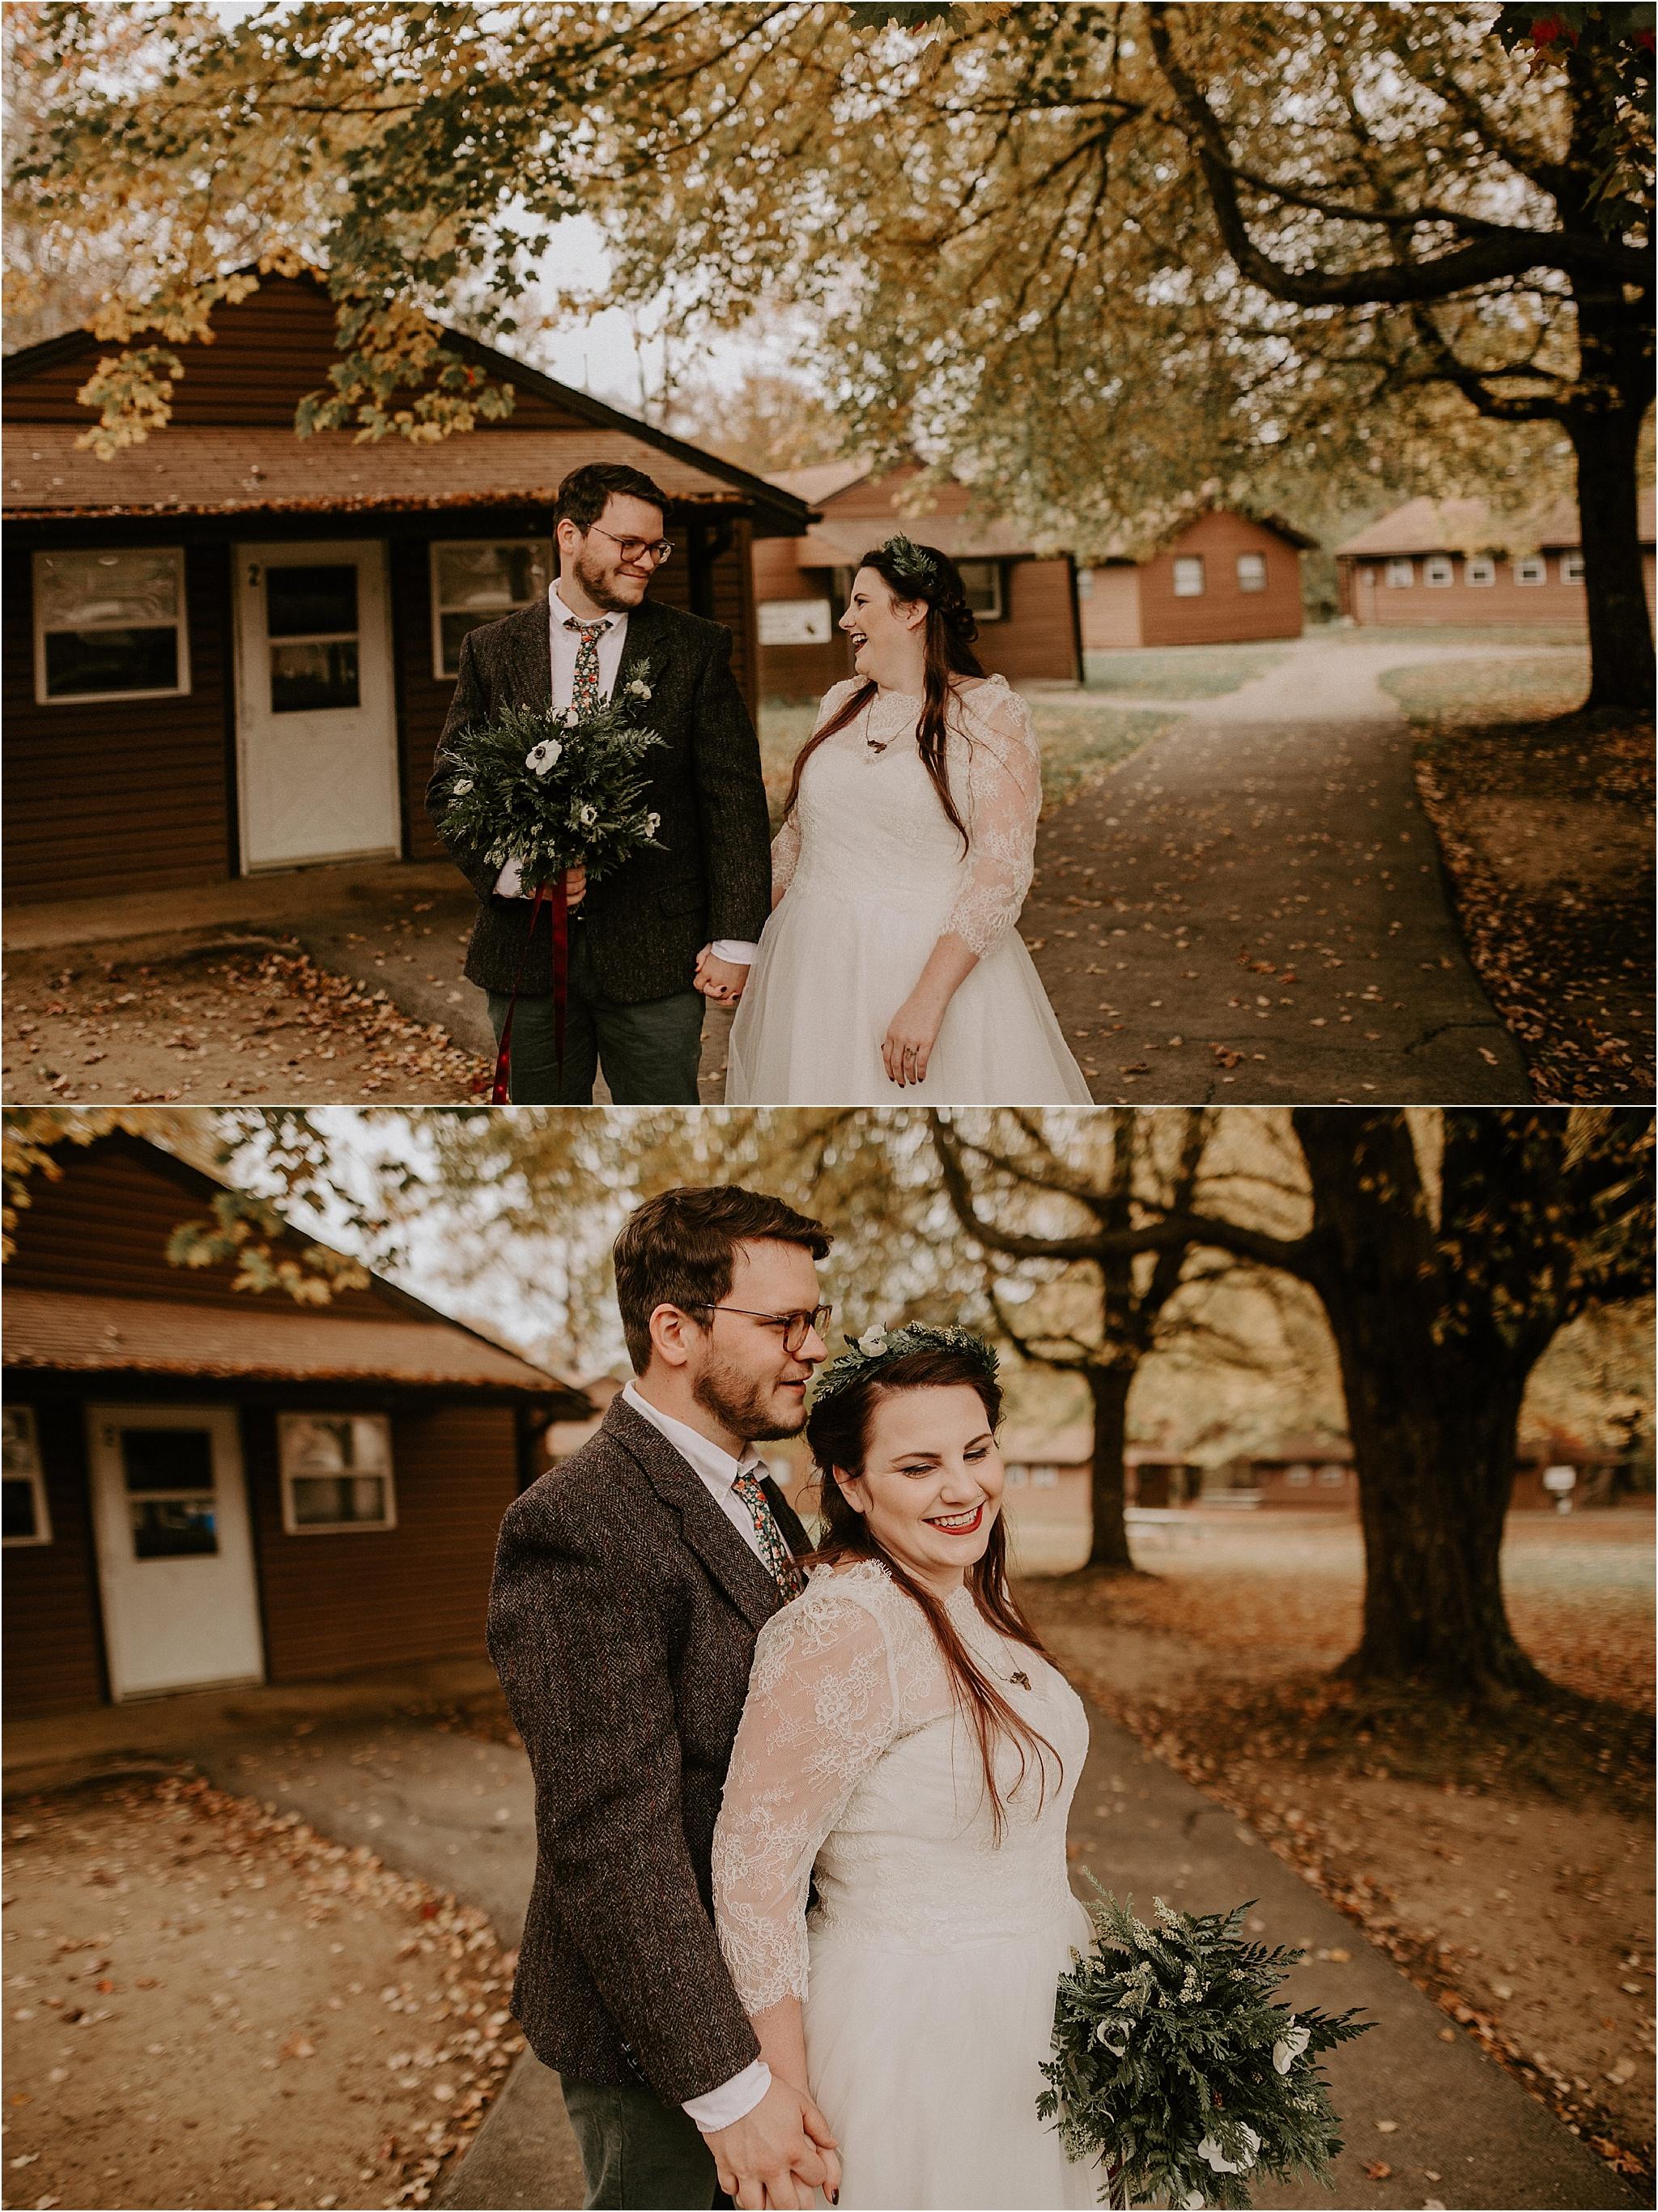 Sarah_Brookhart_Baltimore_Wedding_Photographer_0026.jpg